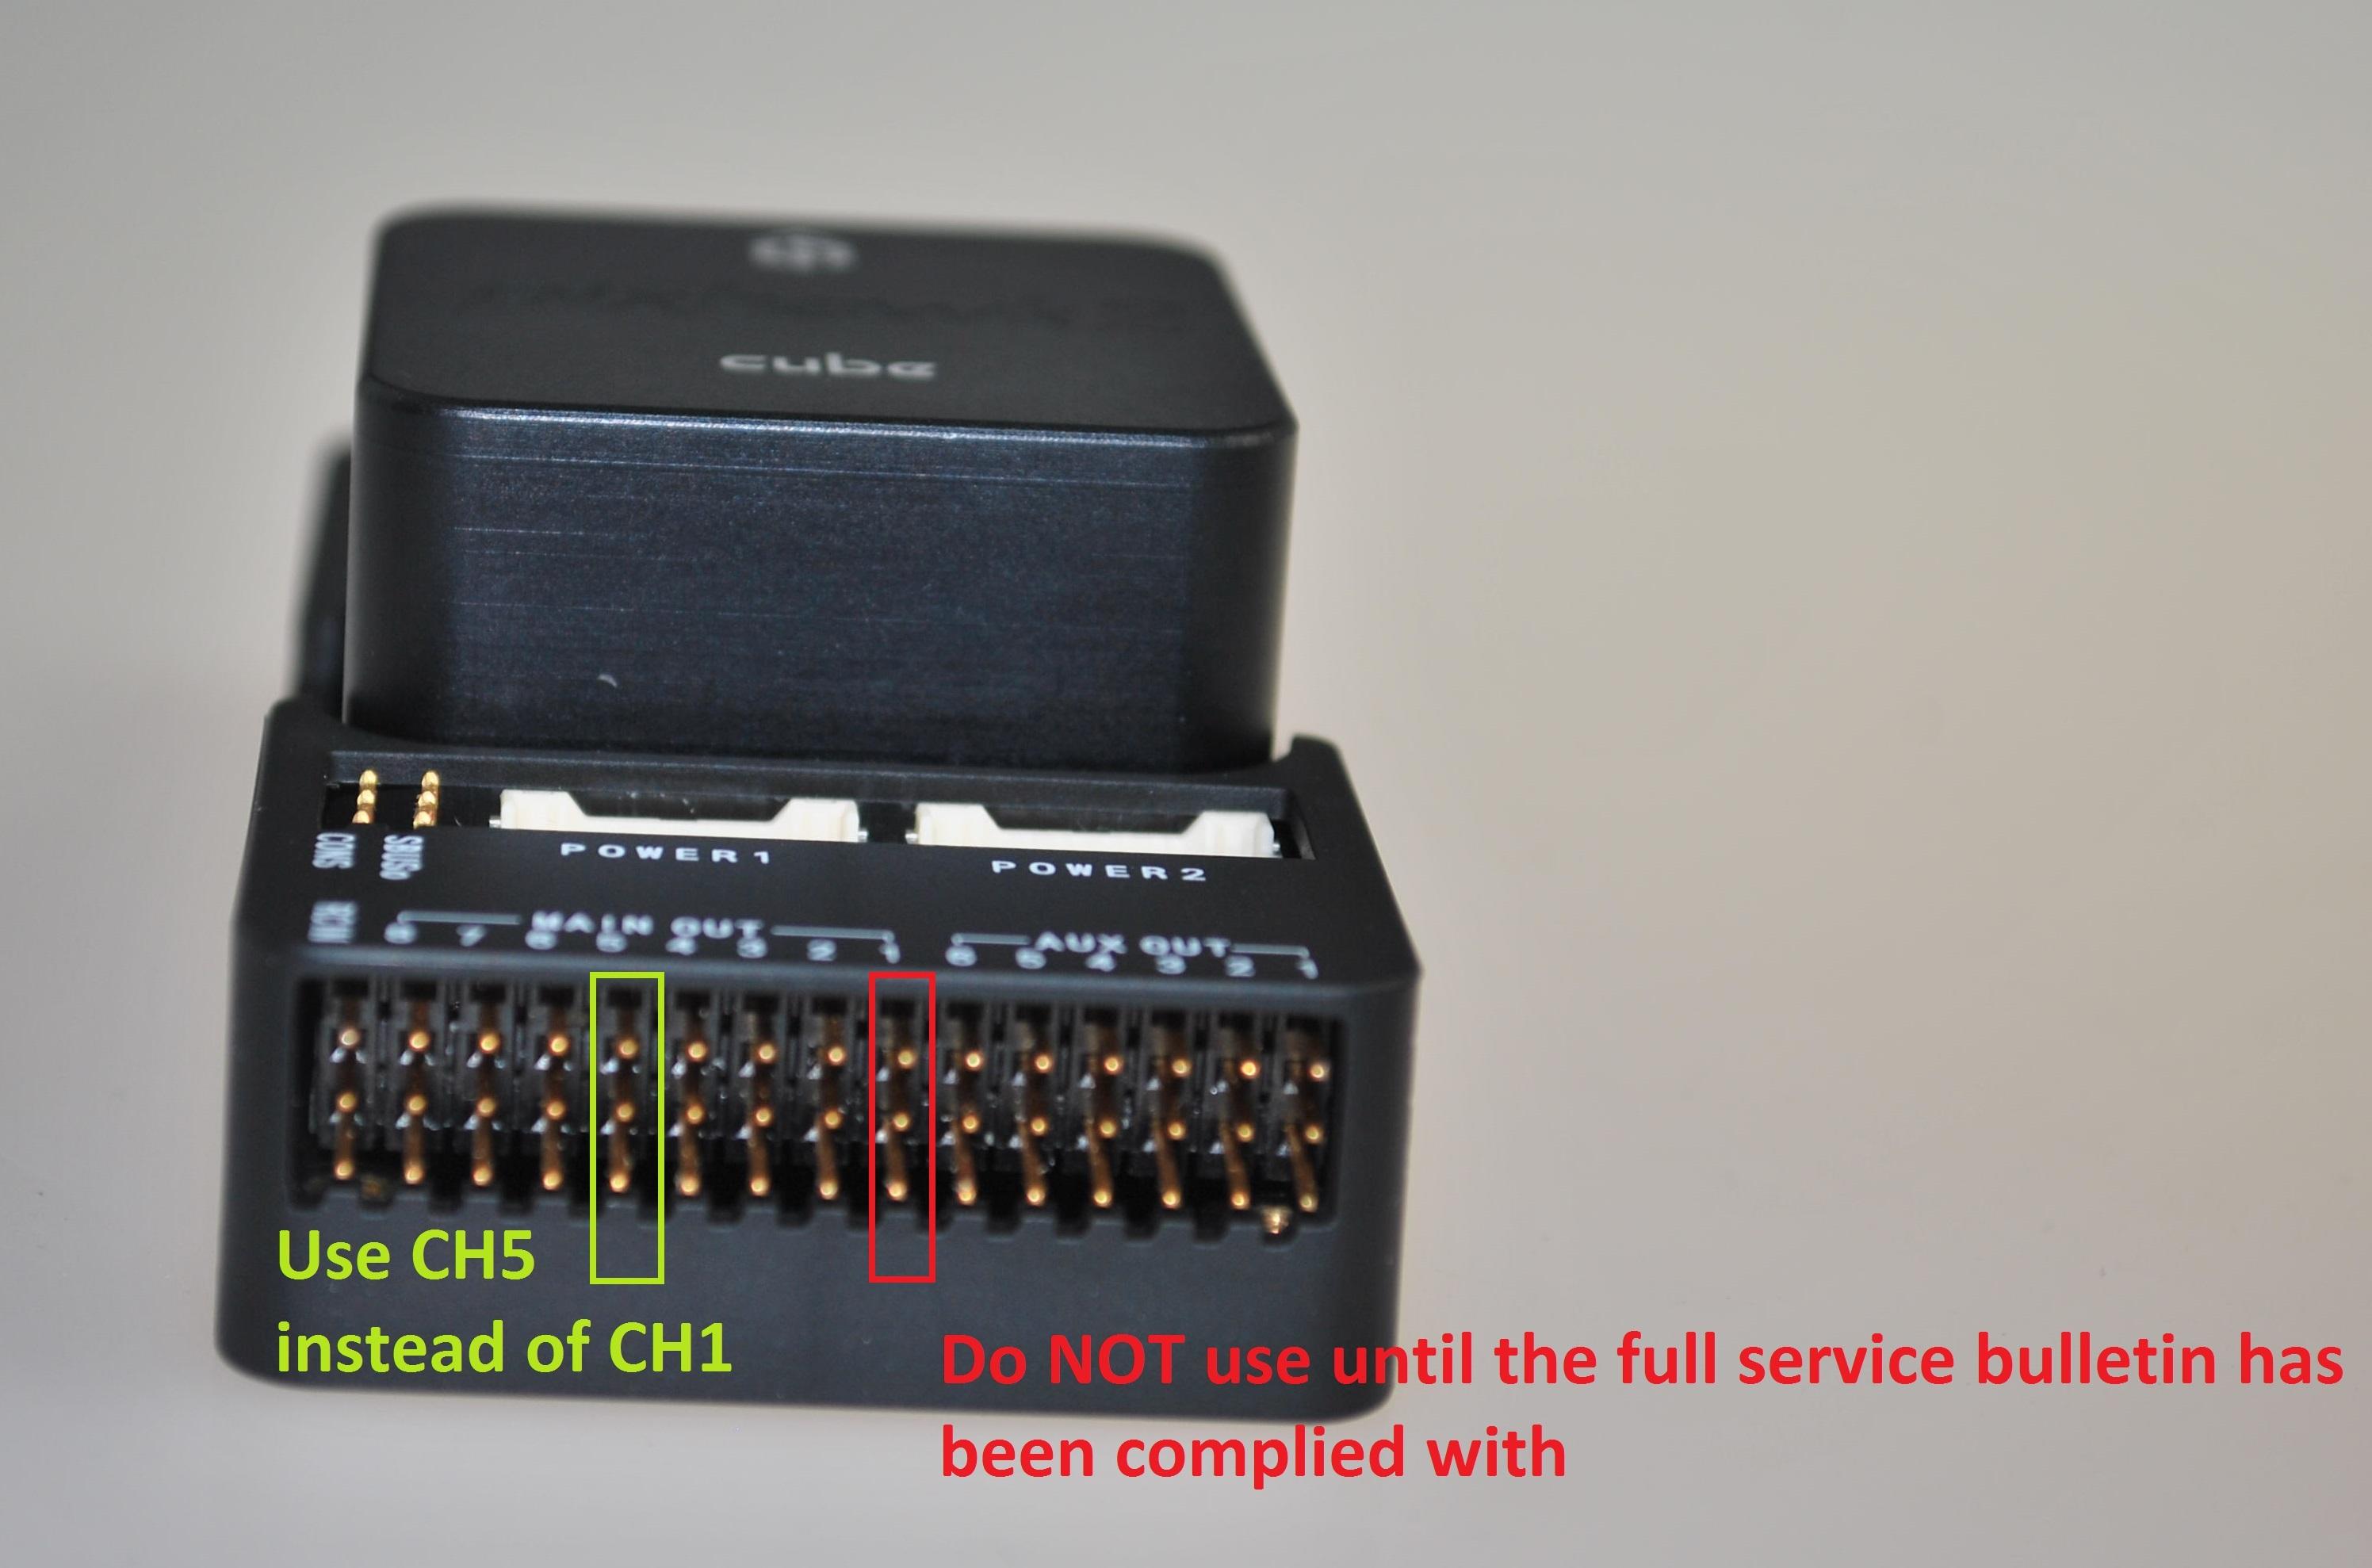 SB_0000001 Critical service bulletin for Beta Cube 2 1 - Pixhawk 2